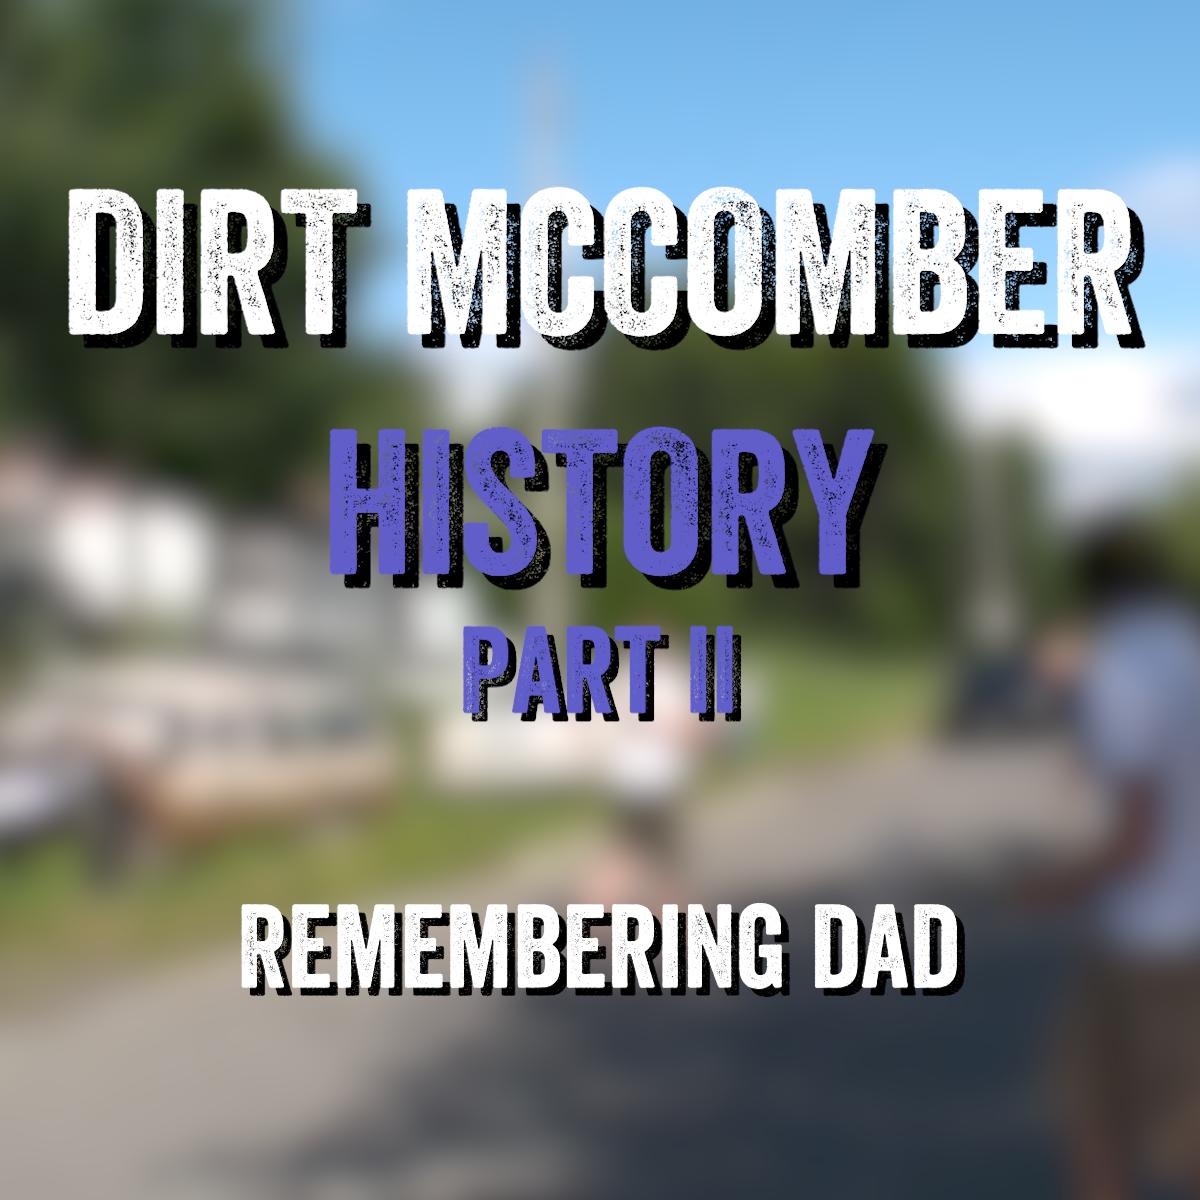 Dirt Dad Part II Image.png